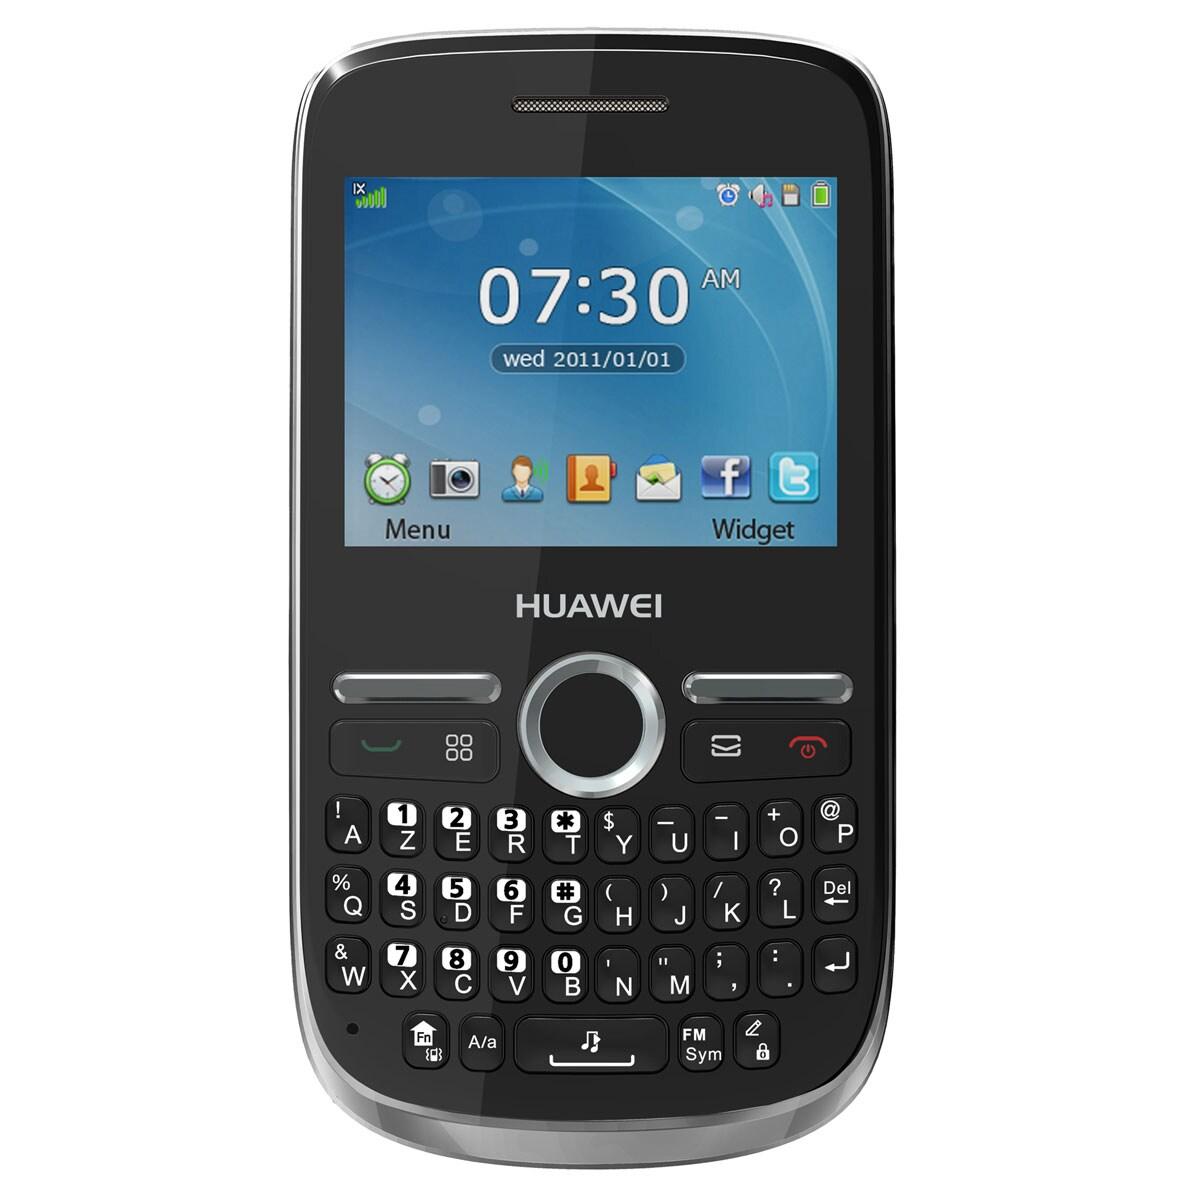 HUAWEI G6608 GSM Unlocked Dual SIM Cell Phone